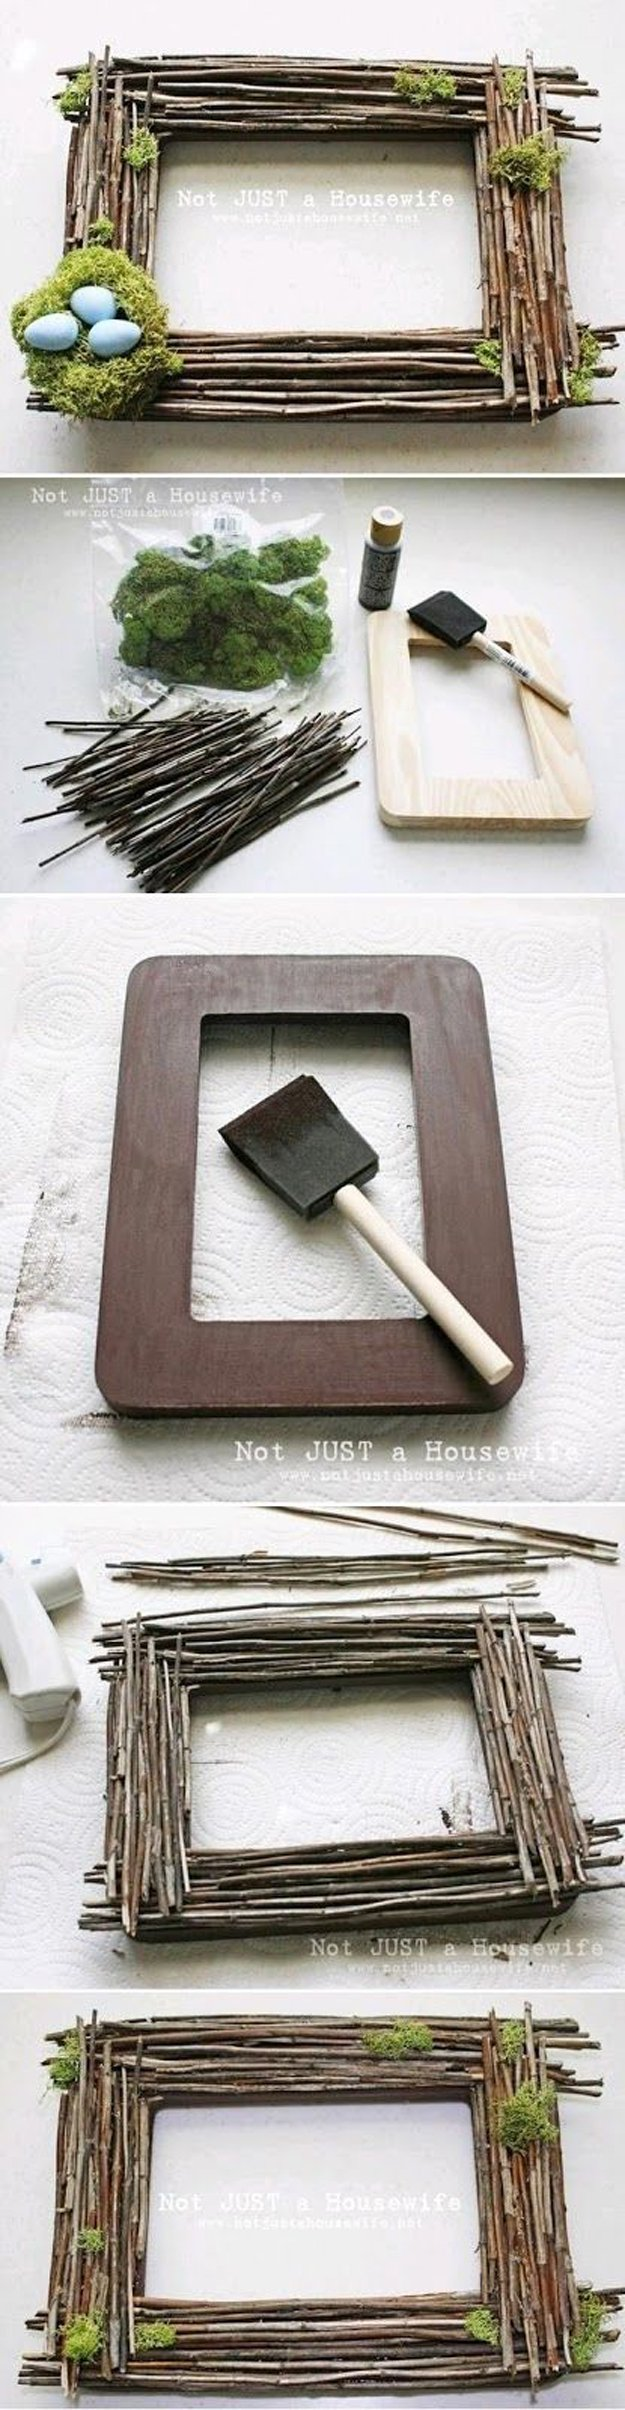 diy photo frame craft ideas naturkinder pinterest bilderrahmen holz bilderrahmen und holz. Black Bedroom Furniture Sets. Home Design Ideas